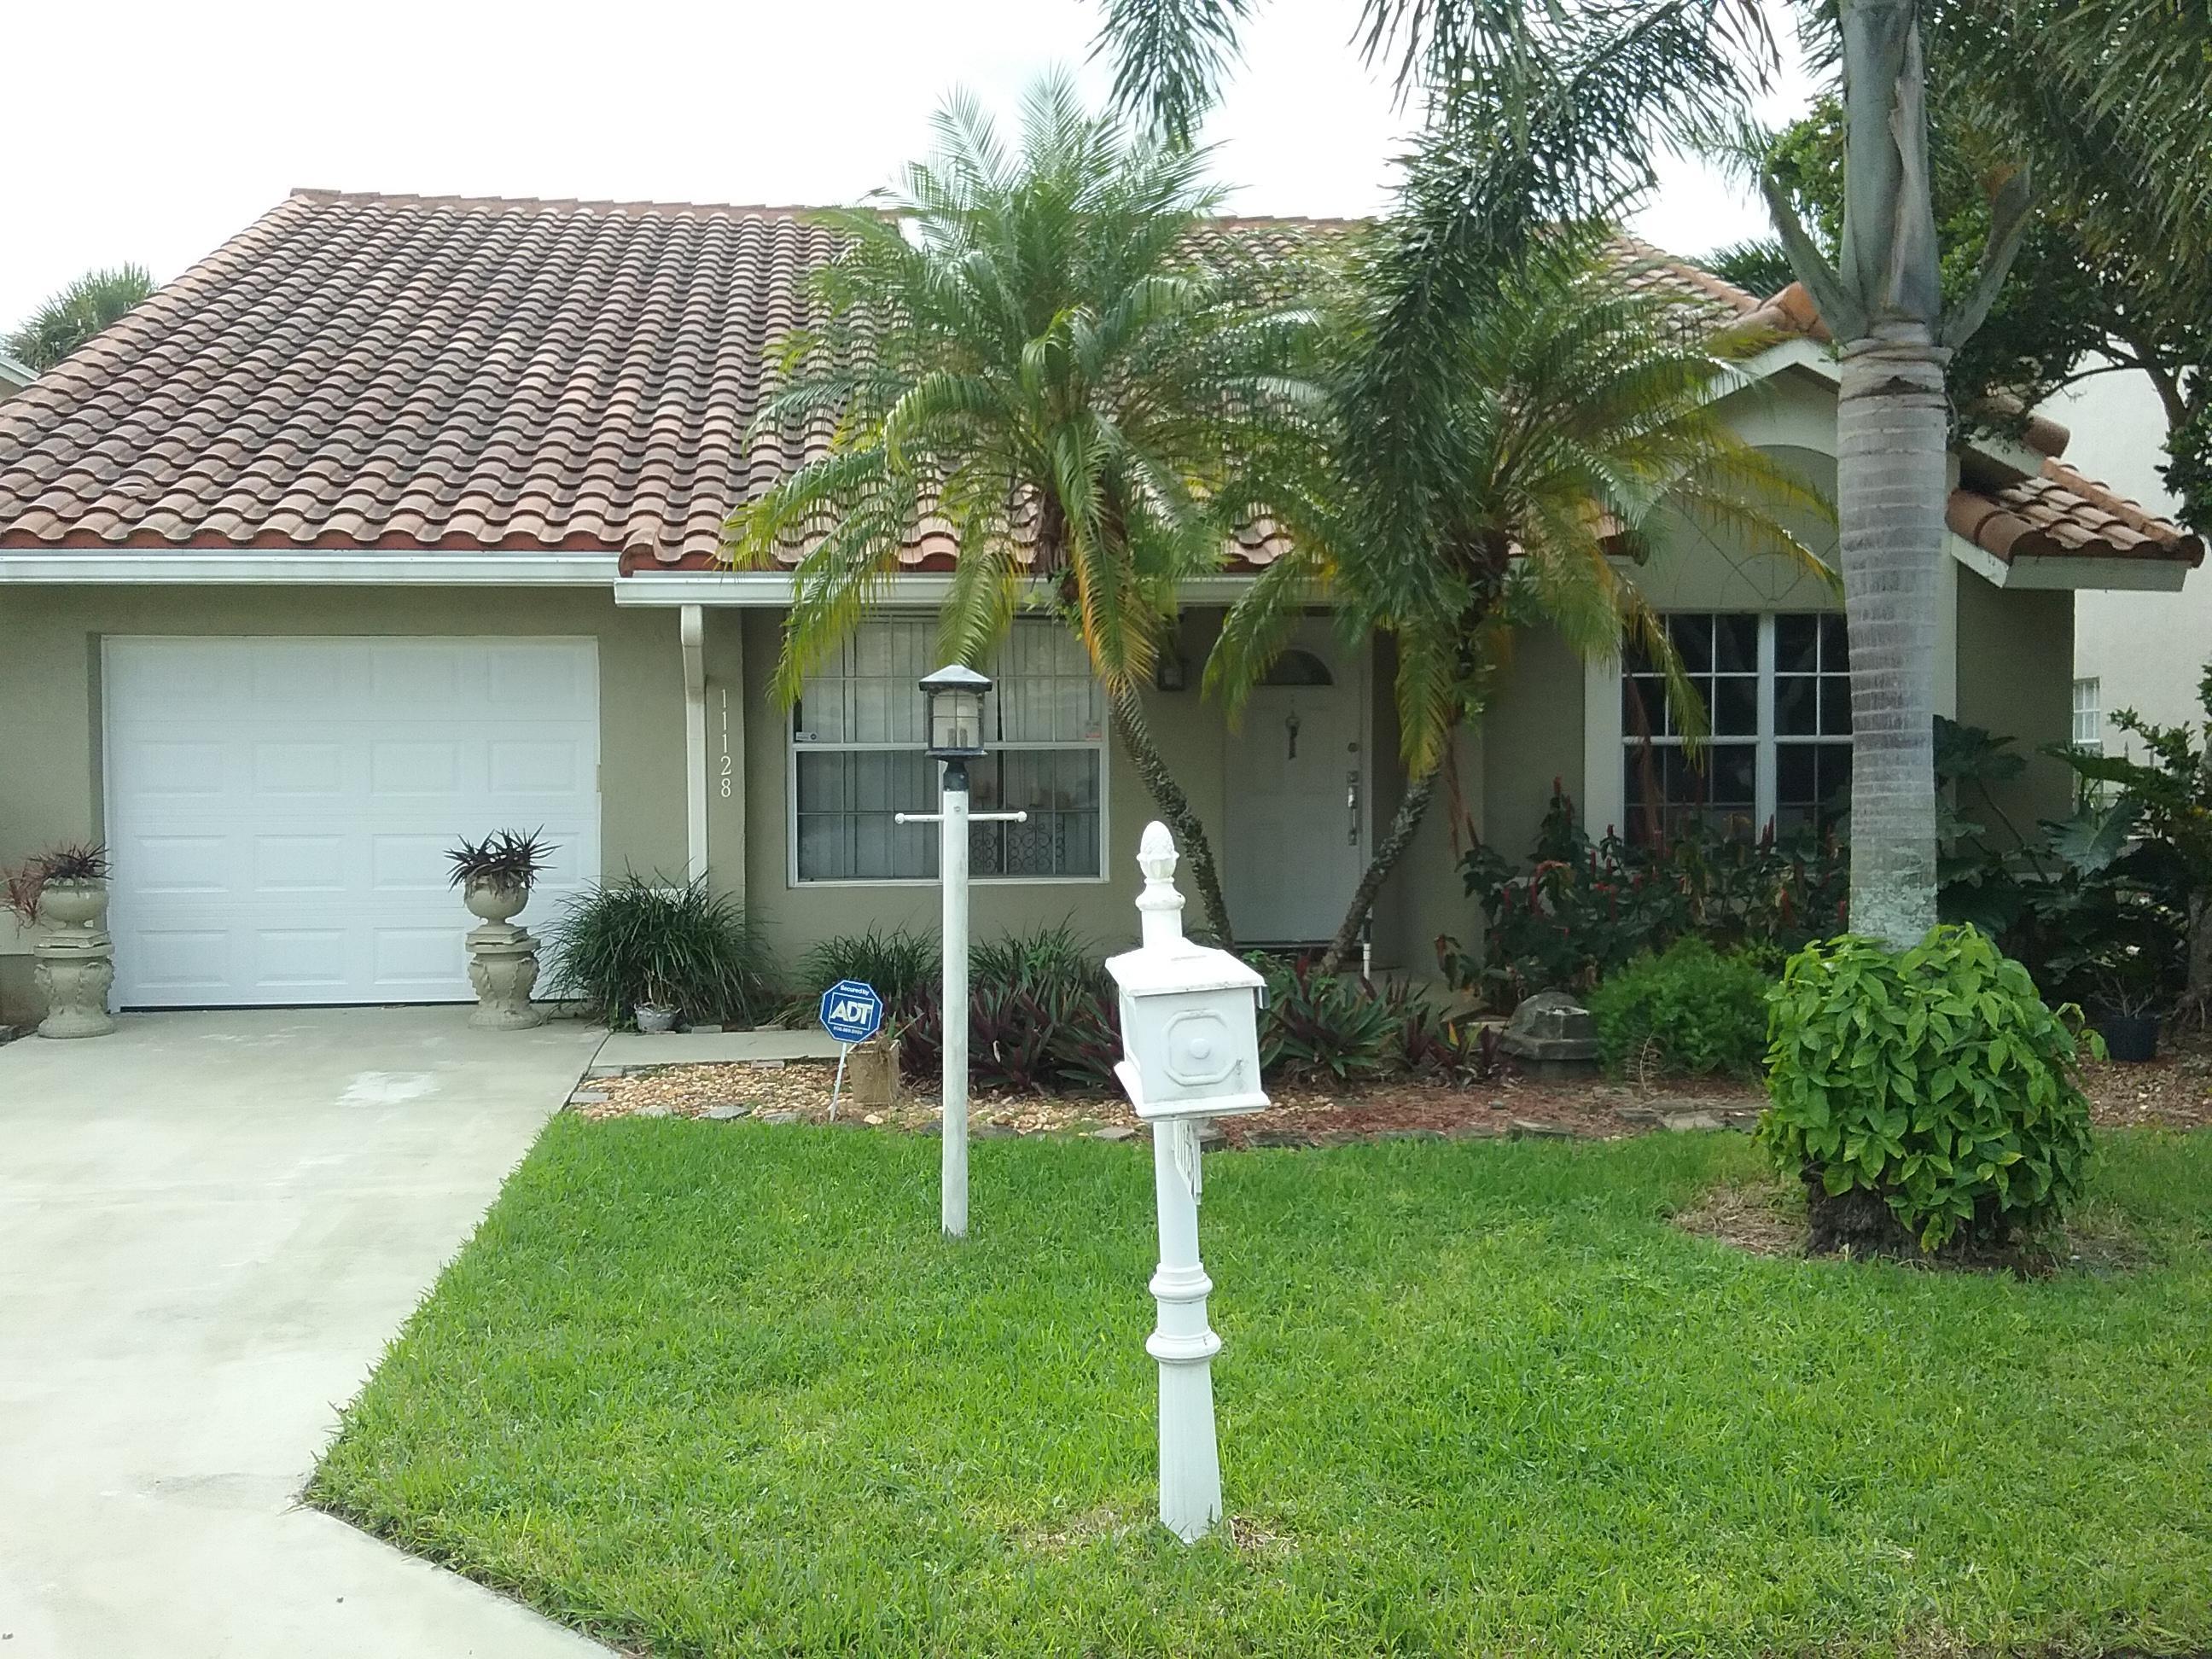 11128 Lakeaire Circle, Boca Raton, FL 33498 - Maria Mendelsohn